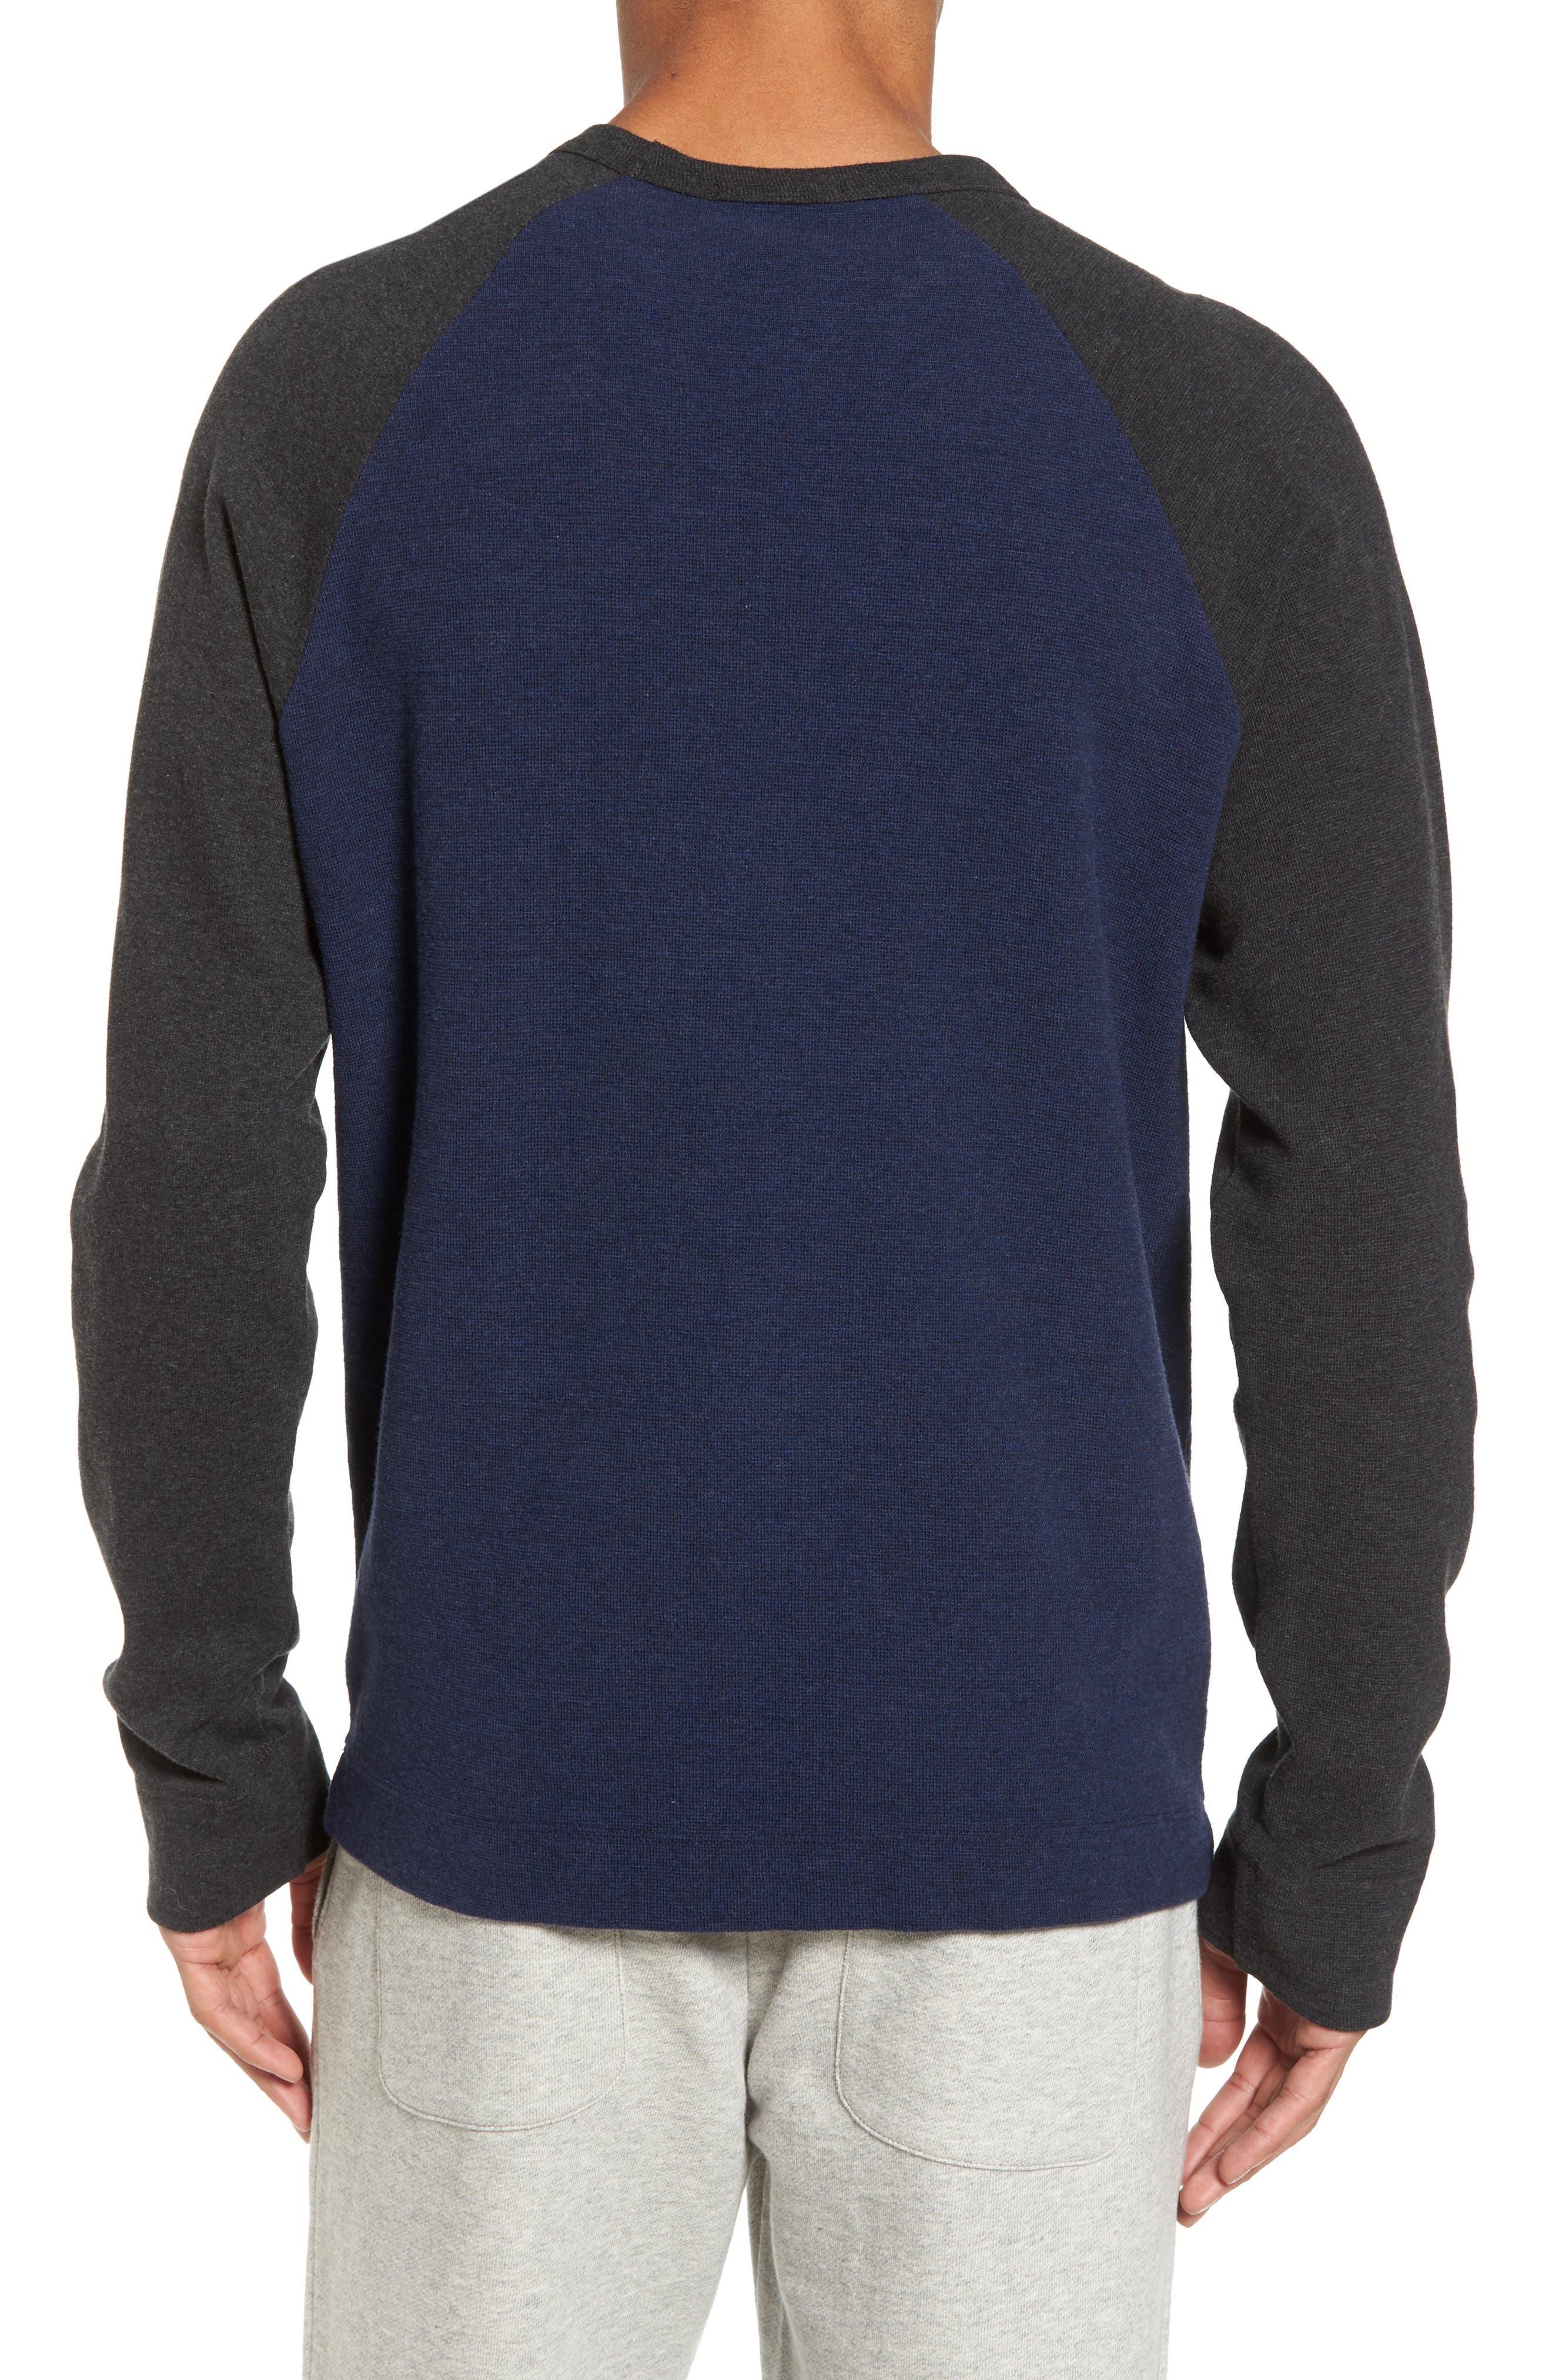 Thermal Knit Raglan Sweatshirt,                             Alternate thumbnail 2, color,                             Heather Navy/ Heather Charcoal